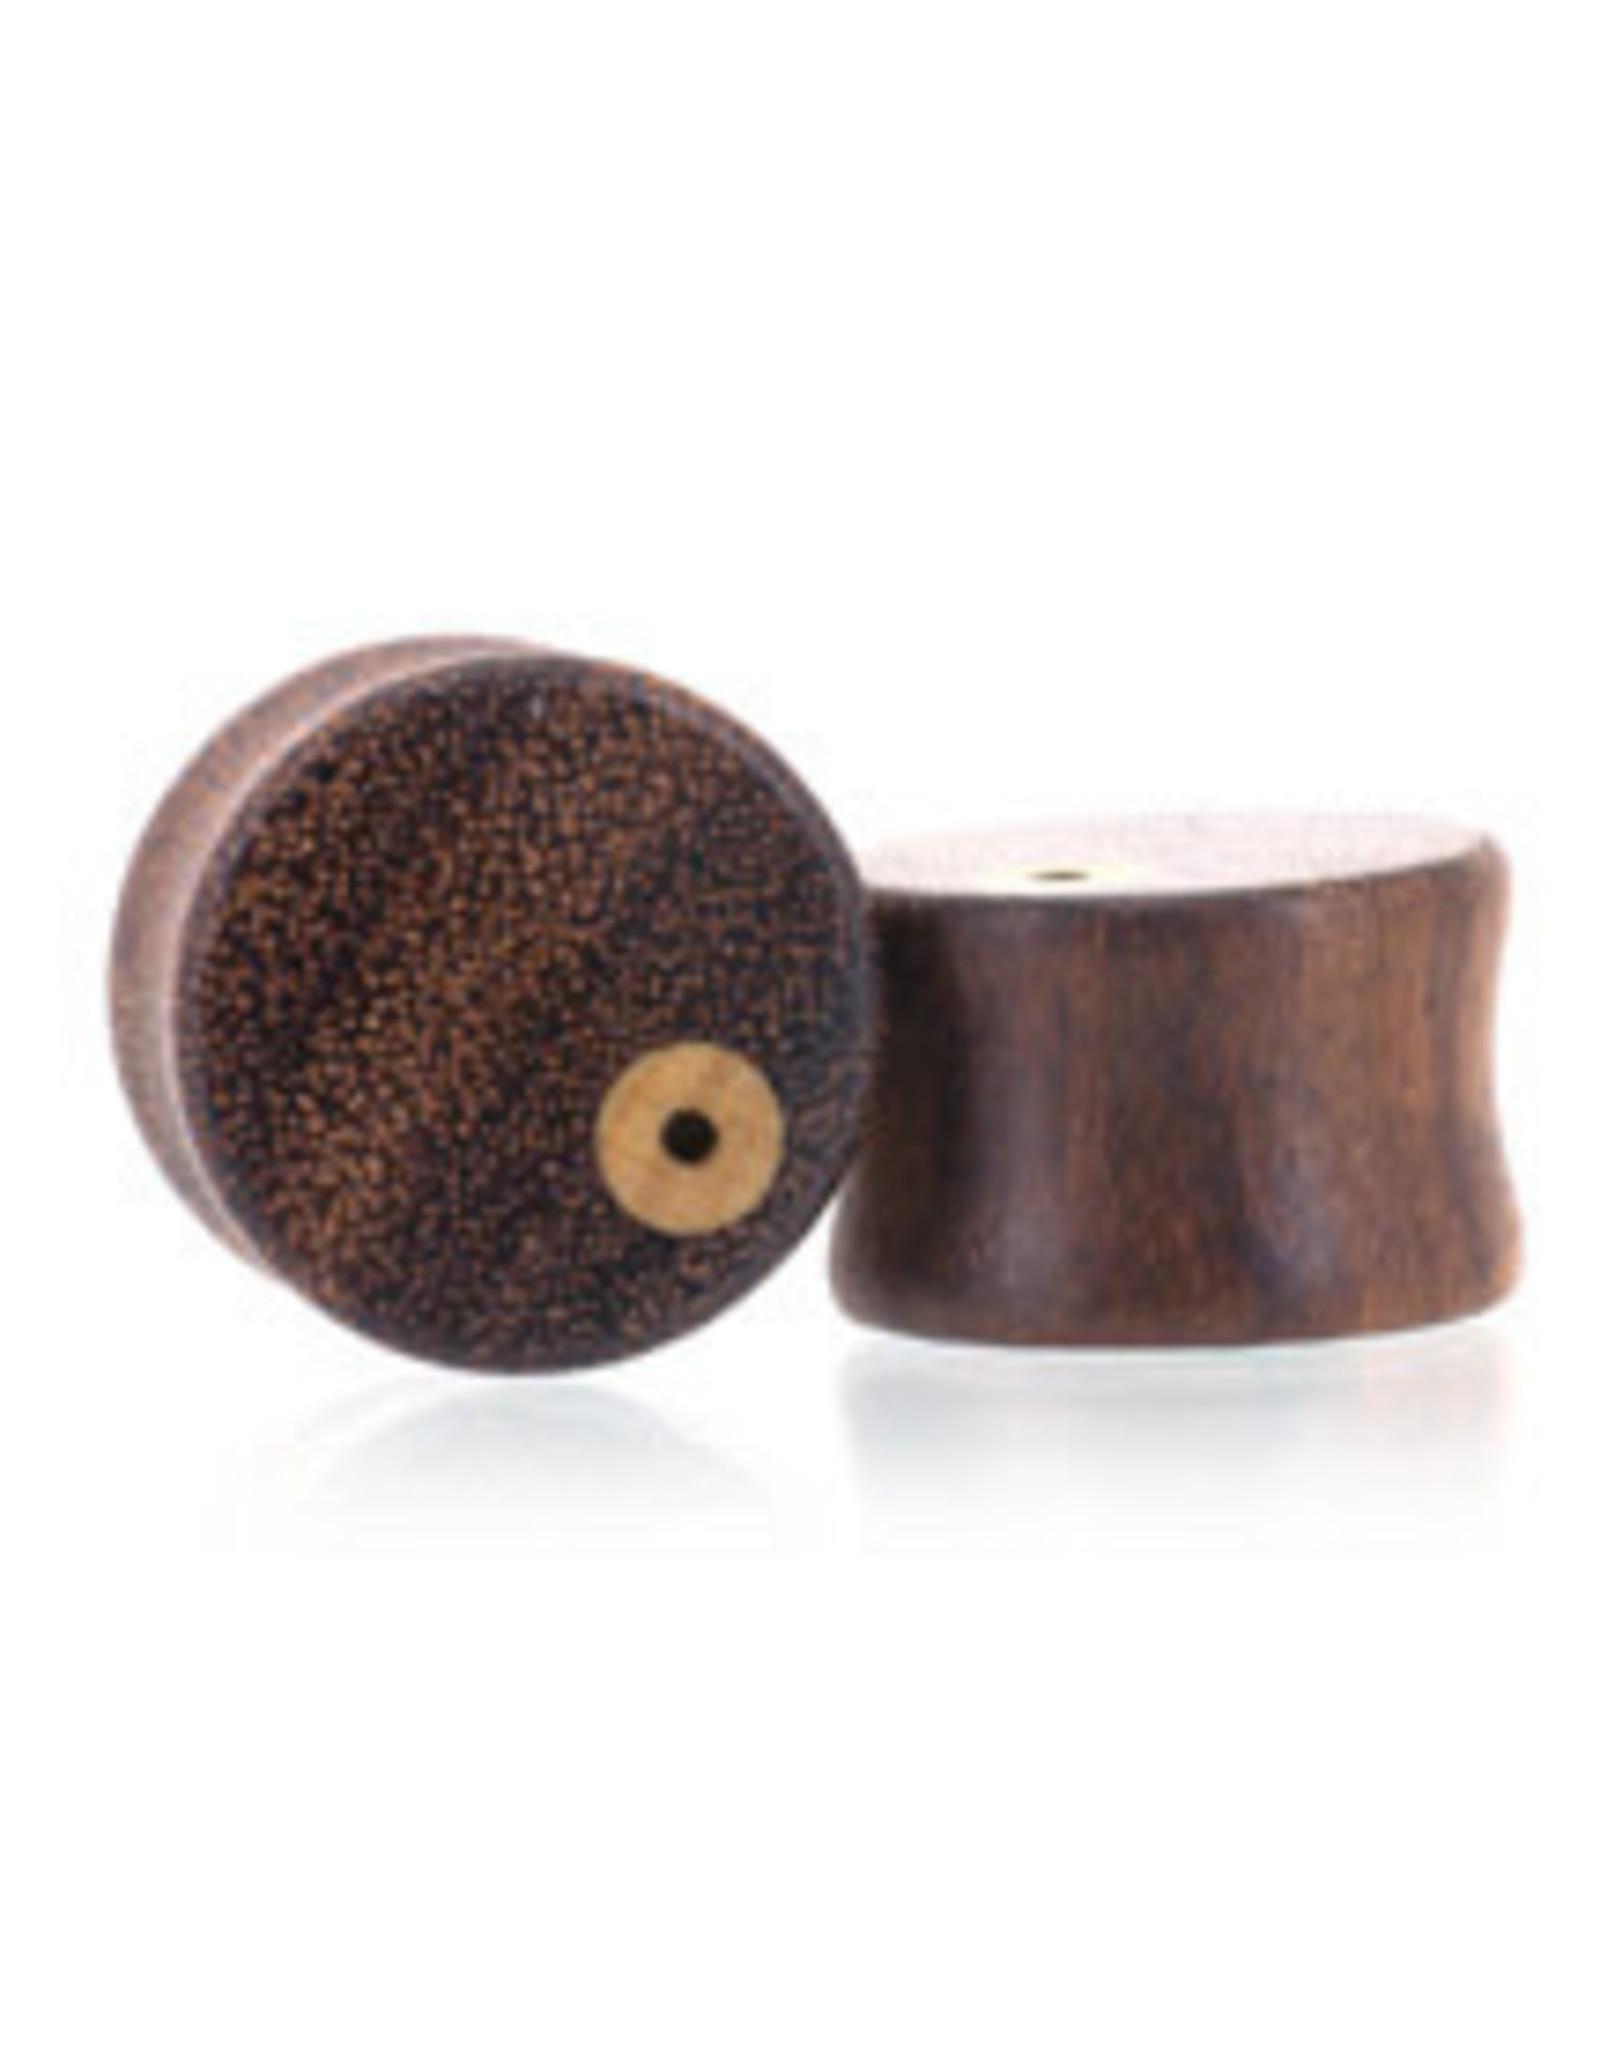 00g Earring Hole Wood Plugs